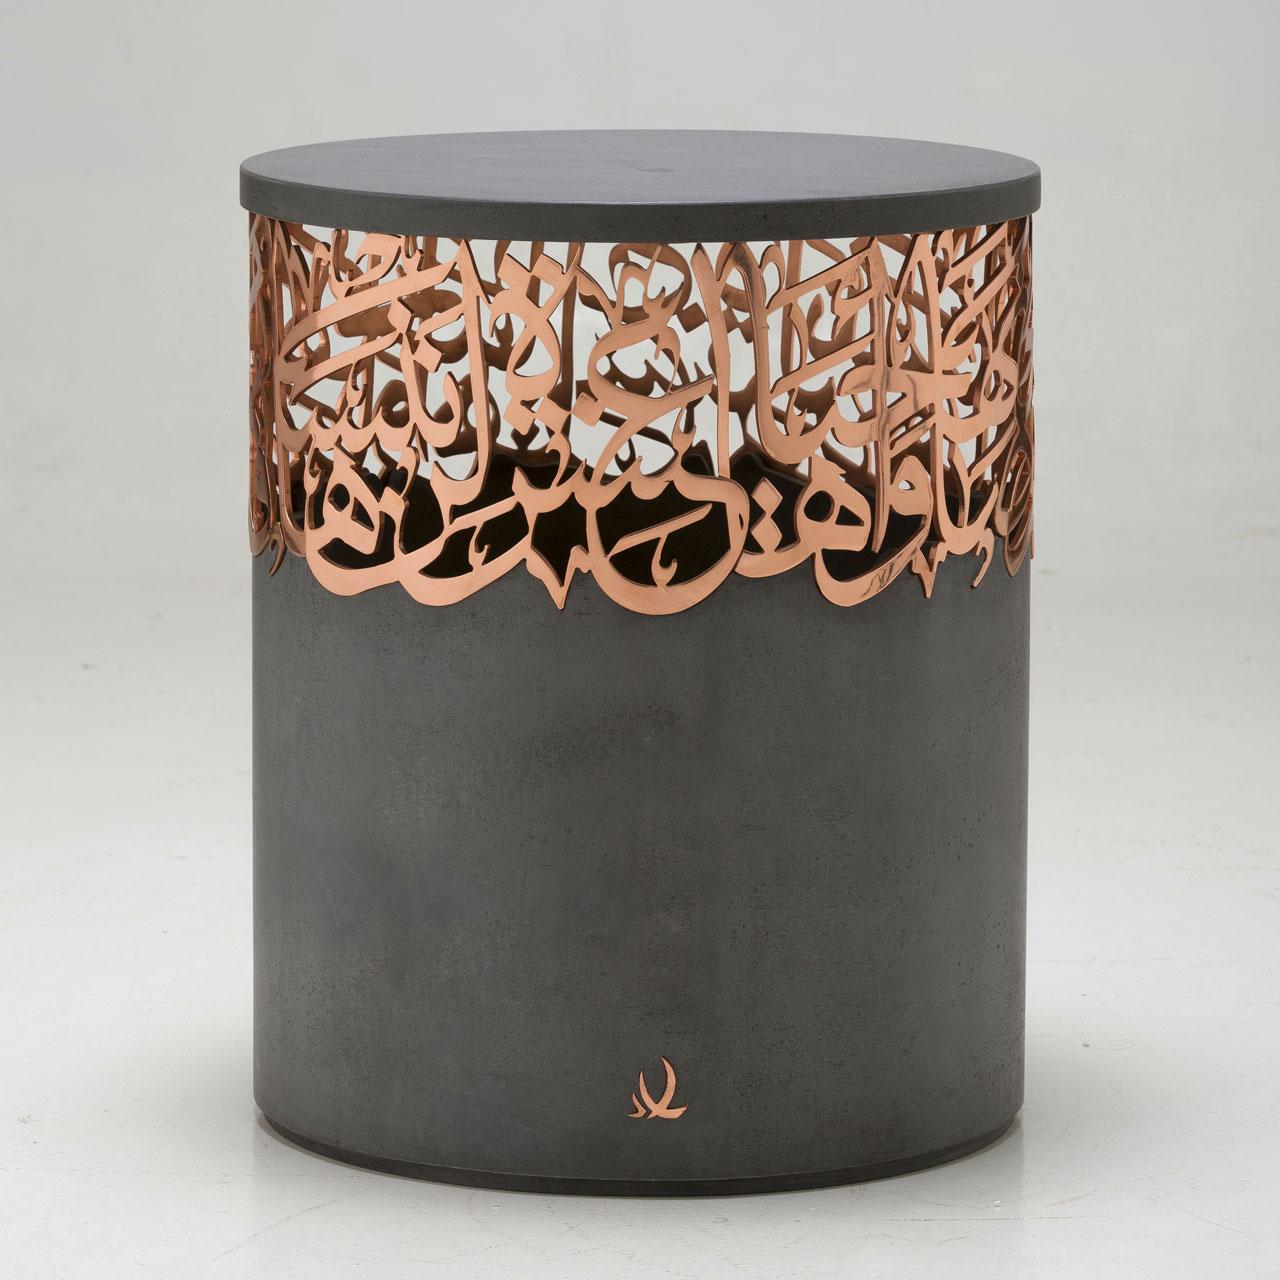 Beirut-basedIyad Najaexplored the reinvention of the table/stool ato'de roseboutiquein Dubai.